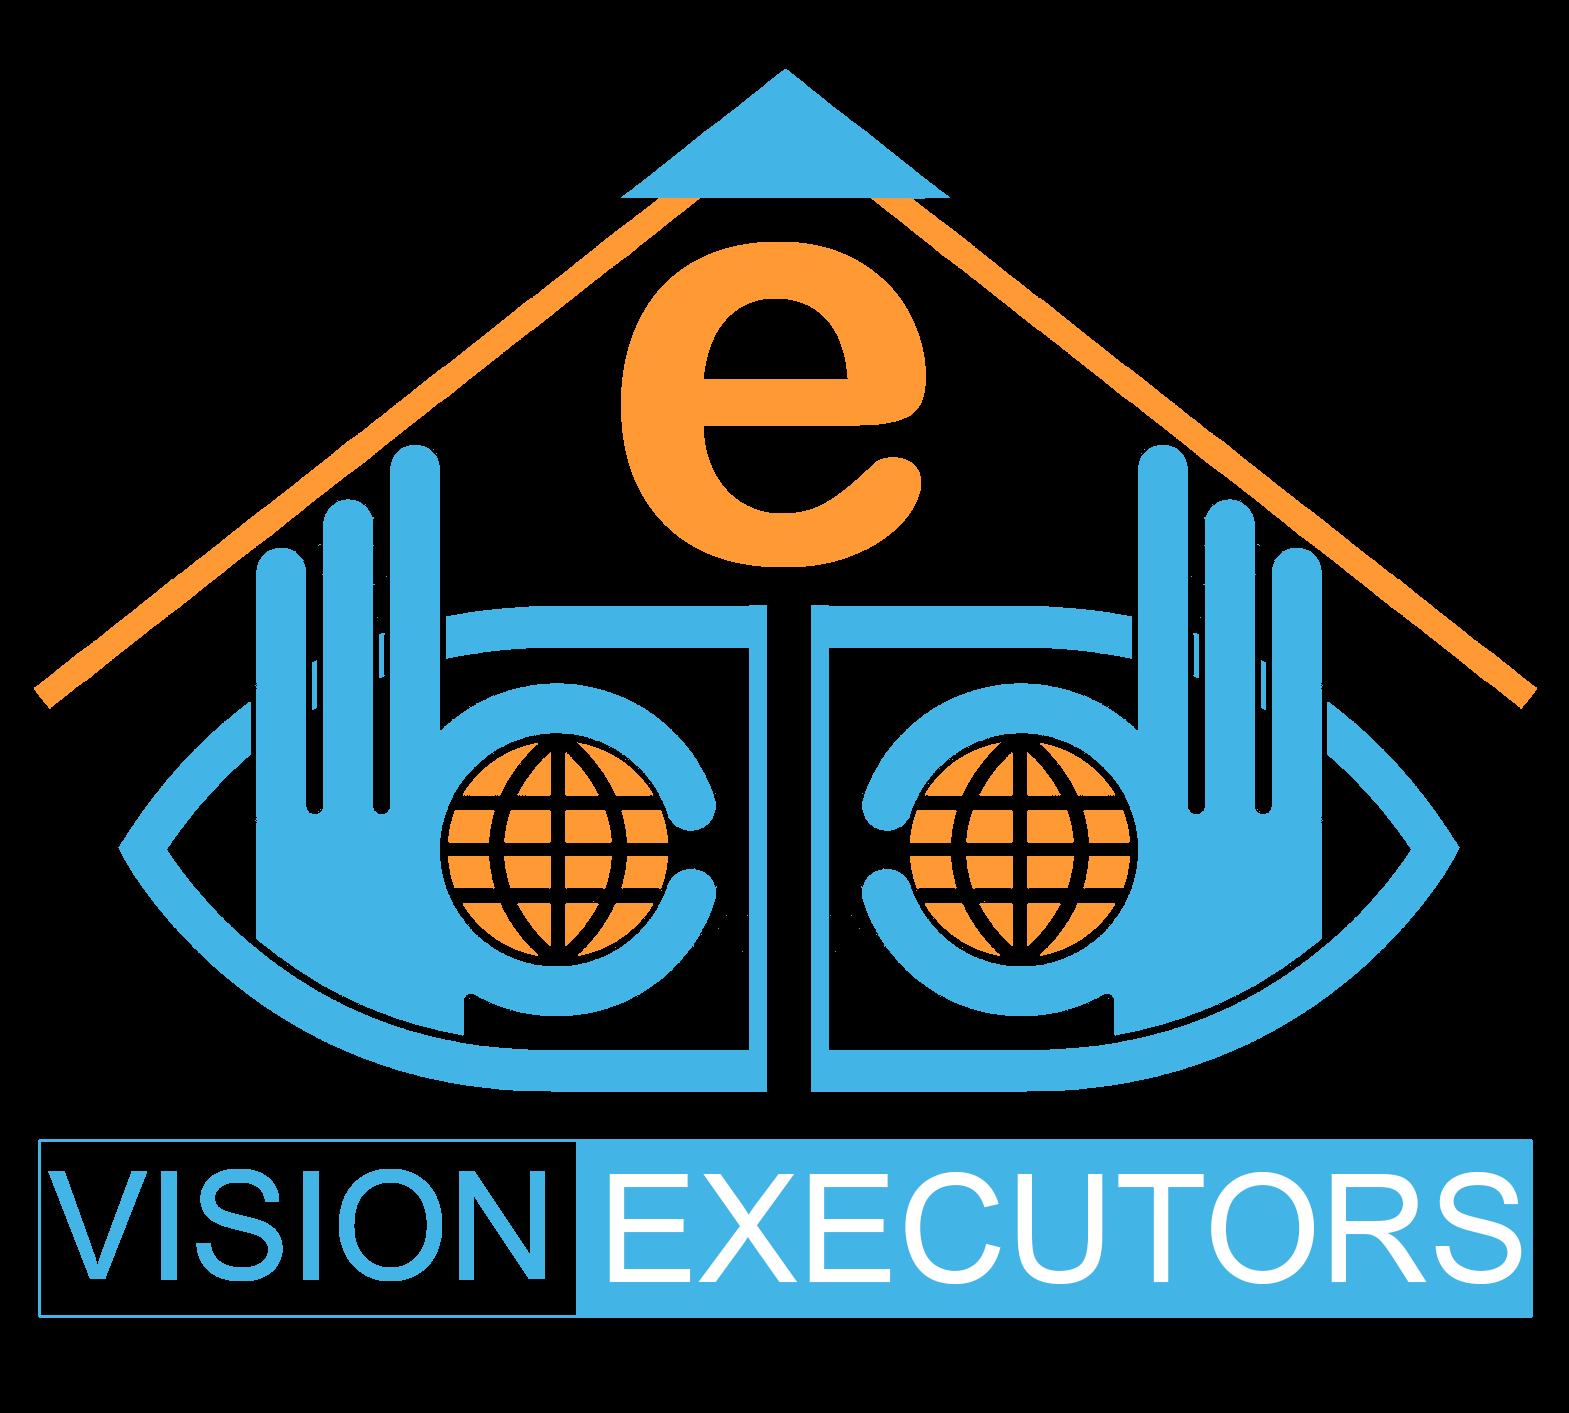 Vision Executors